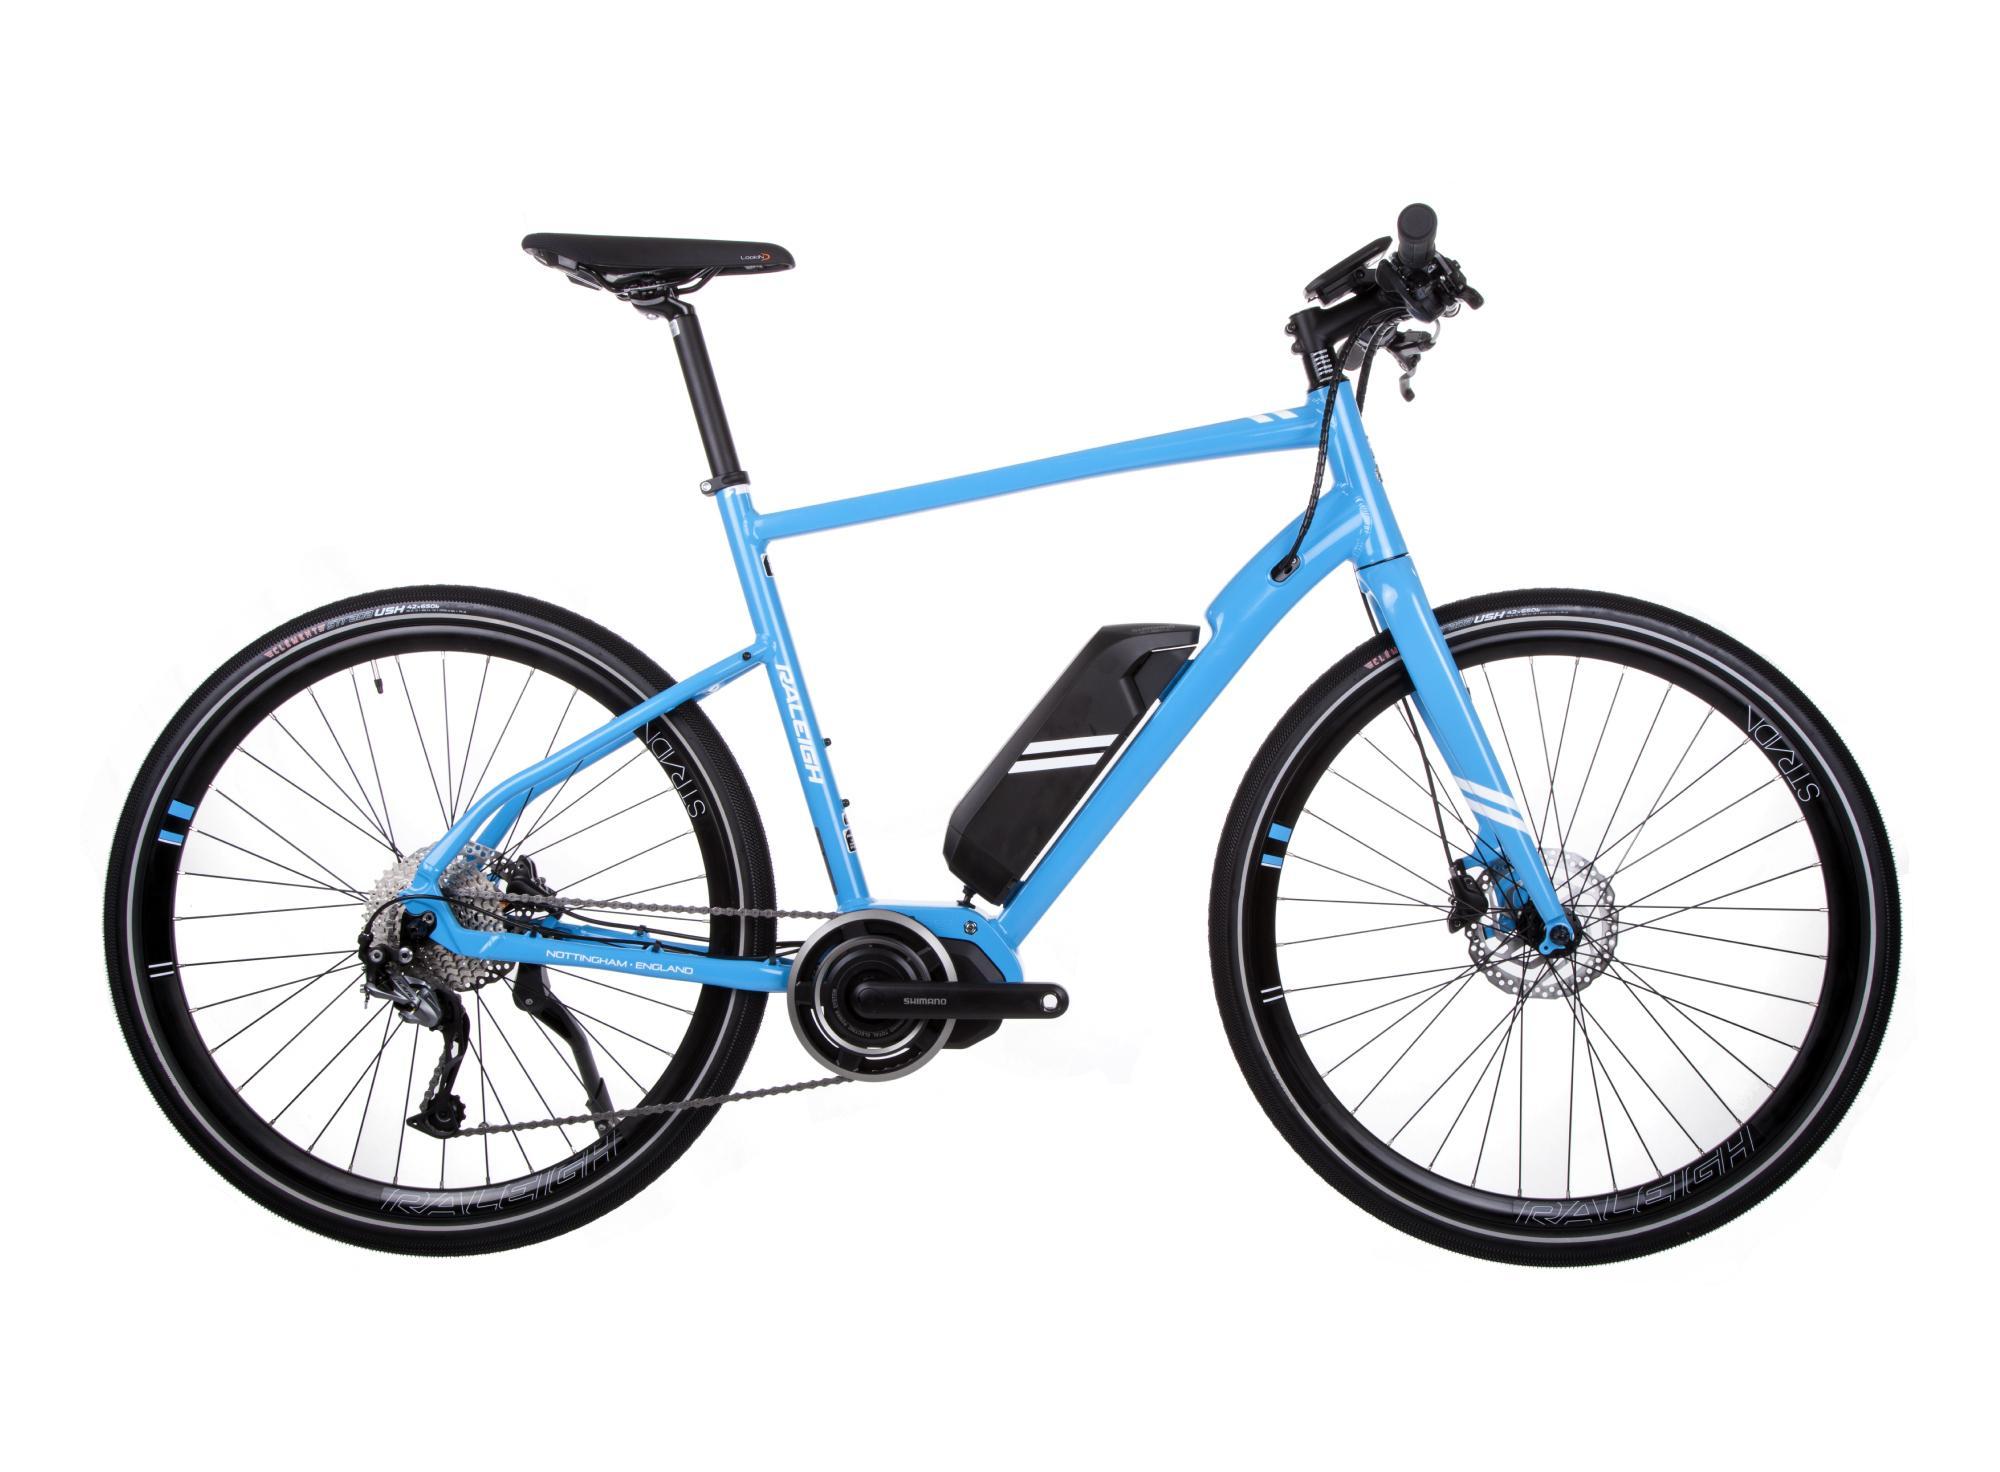 Raleigh strada elite electric bike - £1350 @ Raleigh